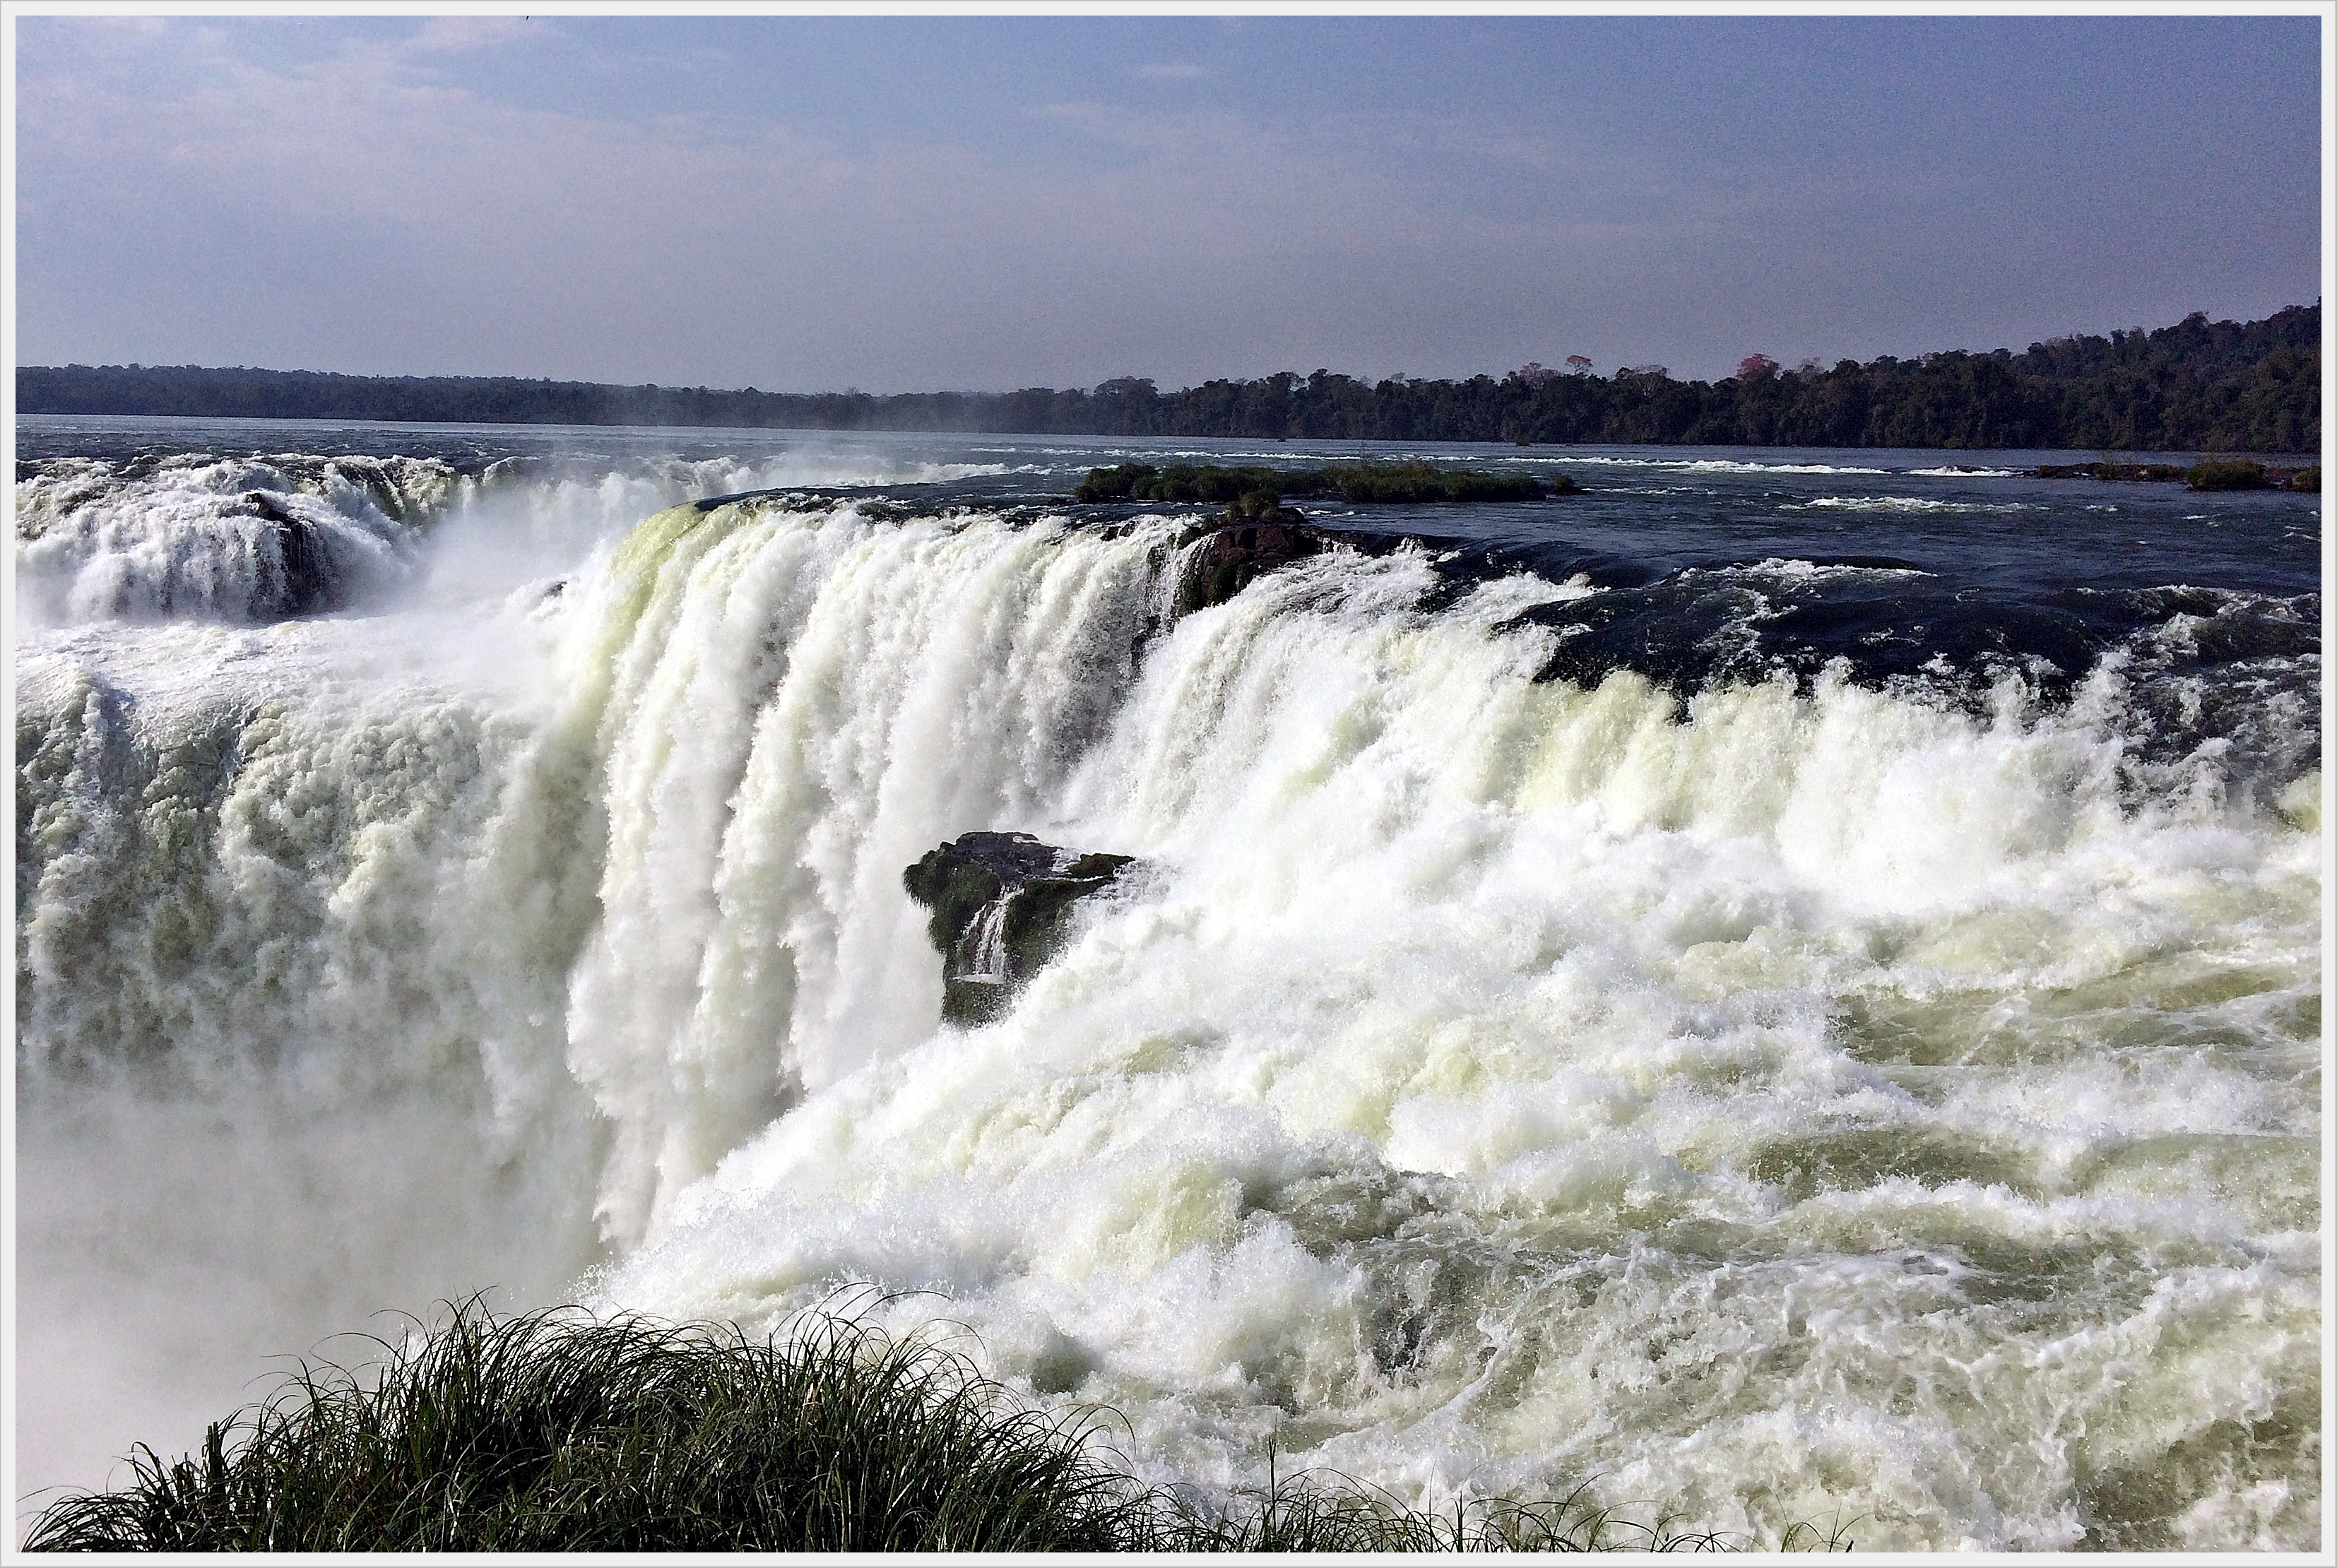 Iguazu Falls (Argentina Side) 2016